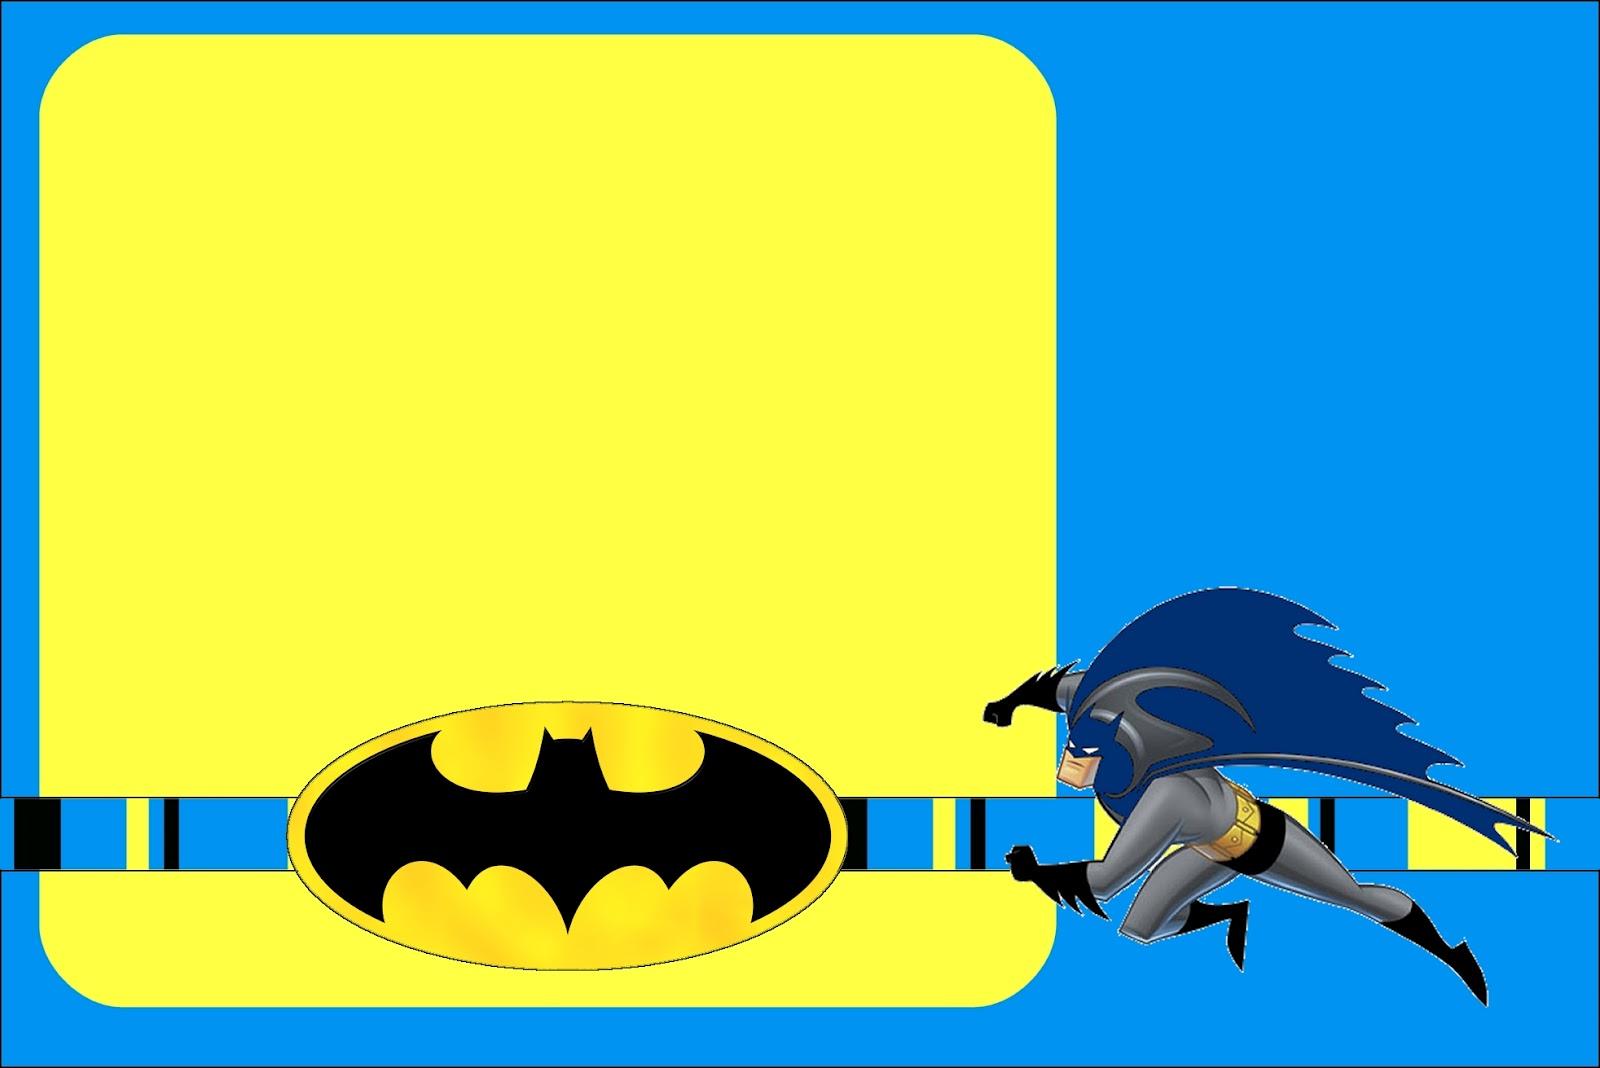 Meu convite e legal: Batman